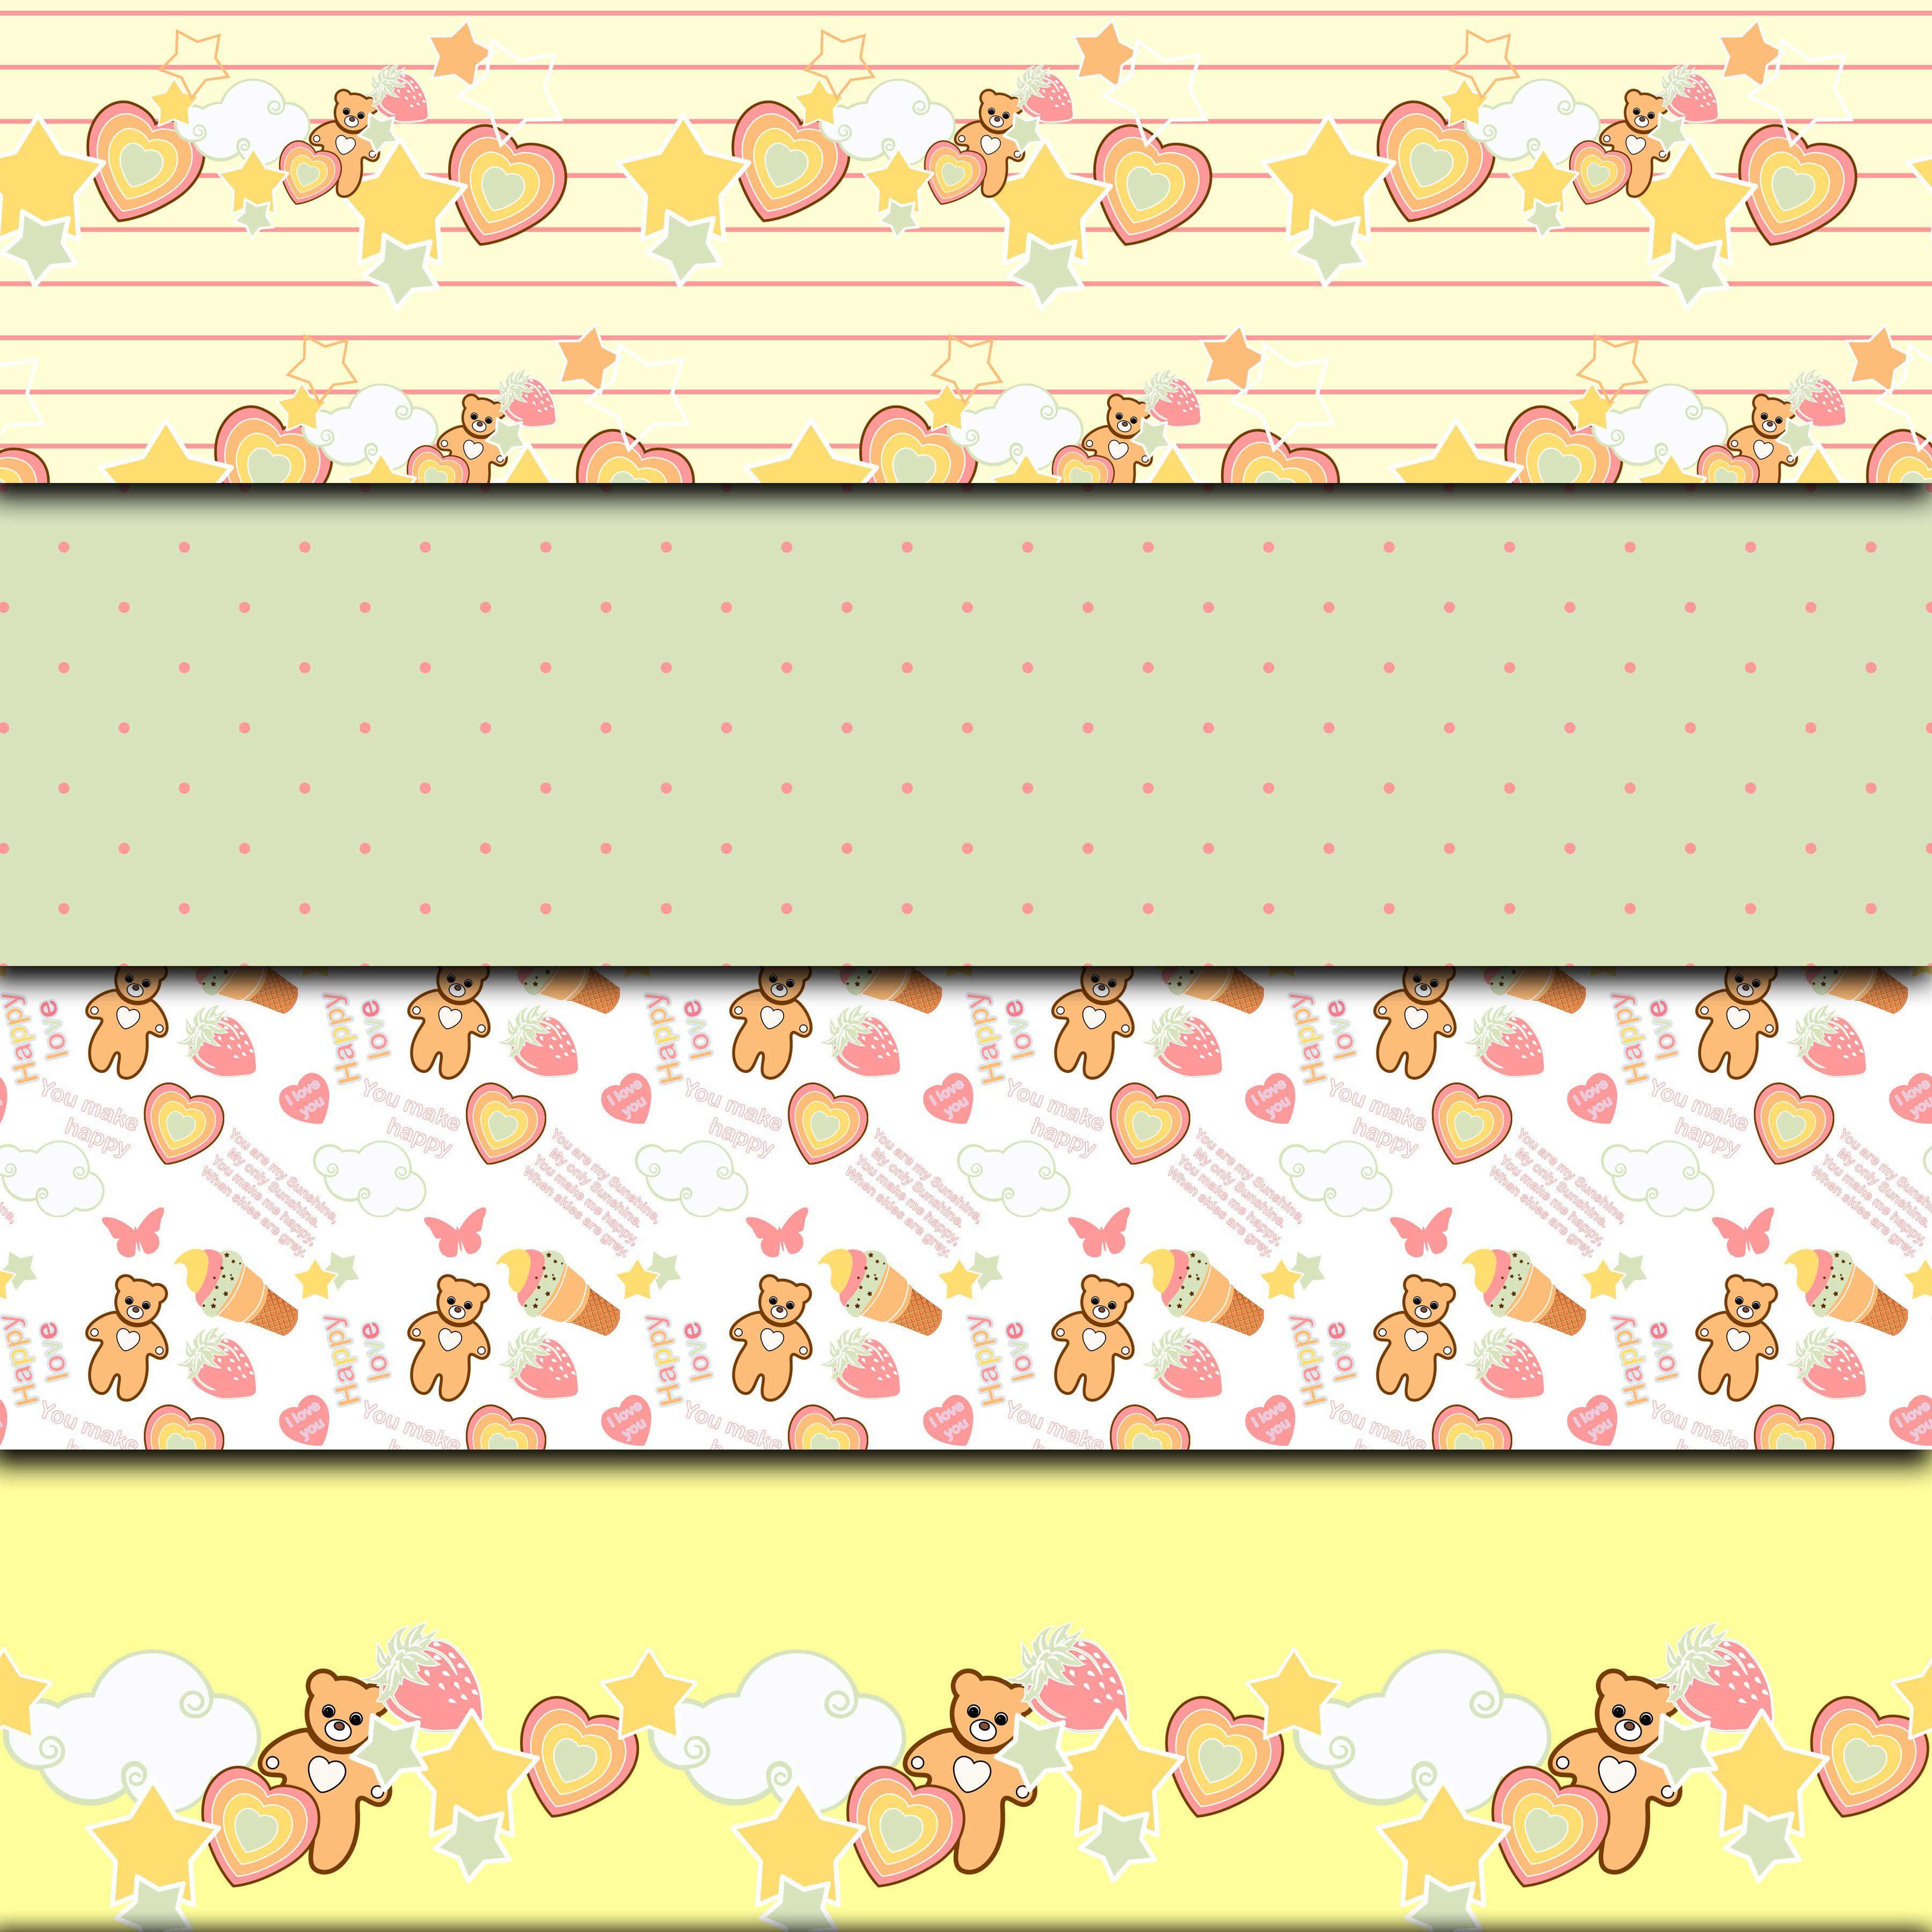 #scrapbooking #cute #digitalpaper #craft #digitaldocuments #patterns #backgrounds #etsy #download #printable